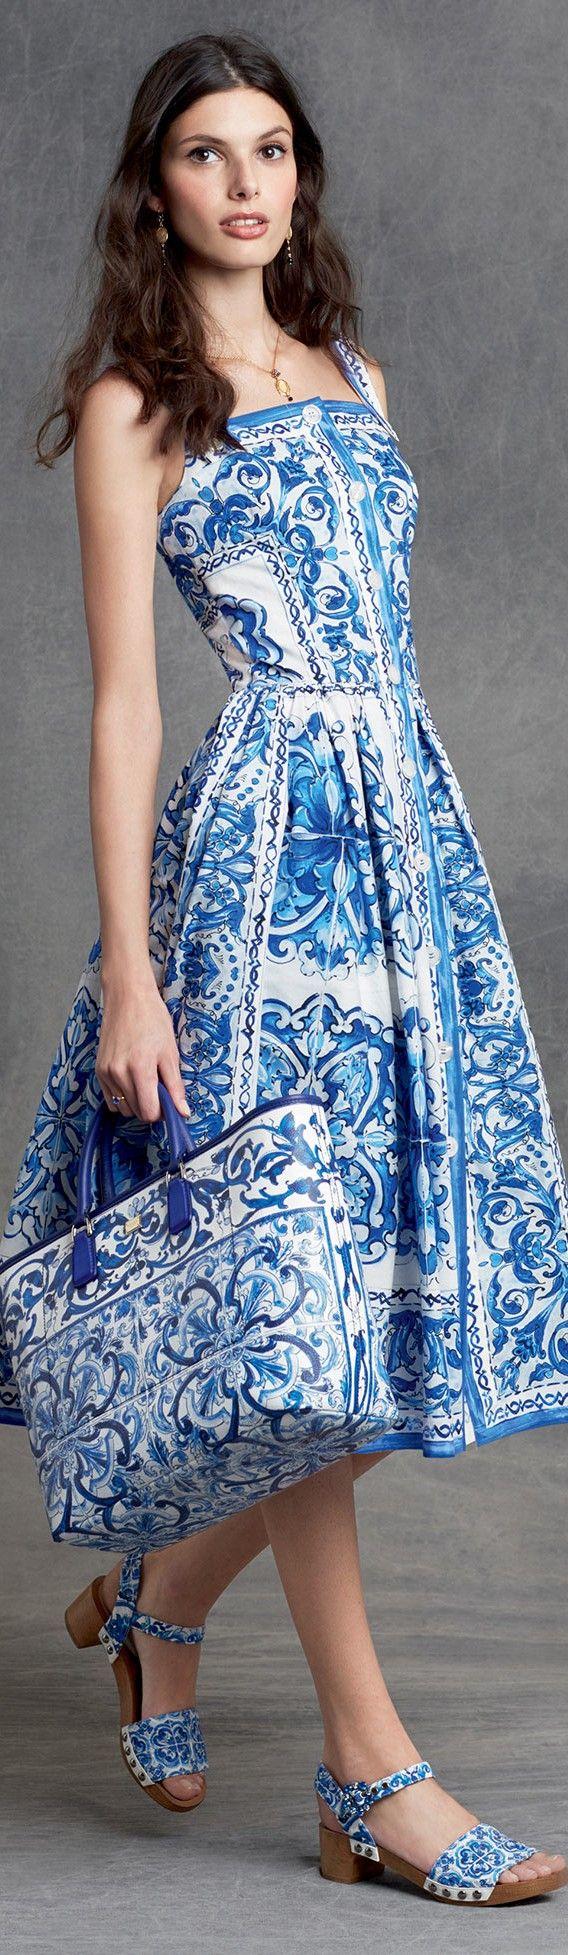 LUXURY BRANDS | Fashion trends with Dolce & Gabbana Fall 2016 | www.bocadolobo.com | #dolcegabbana